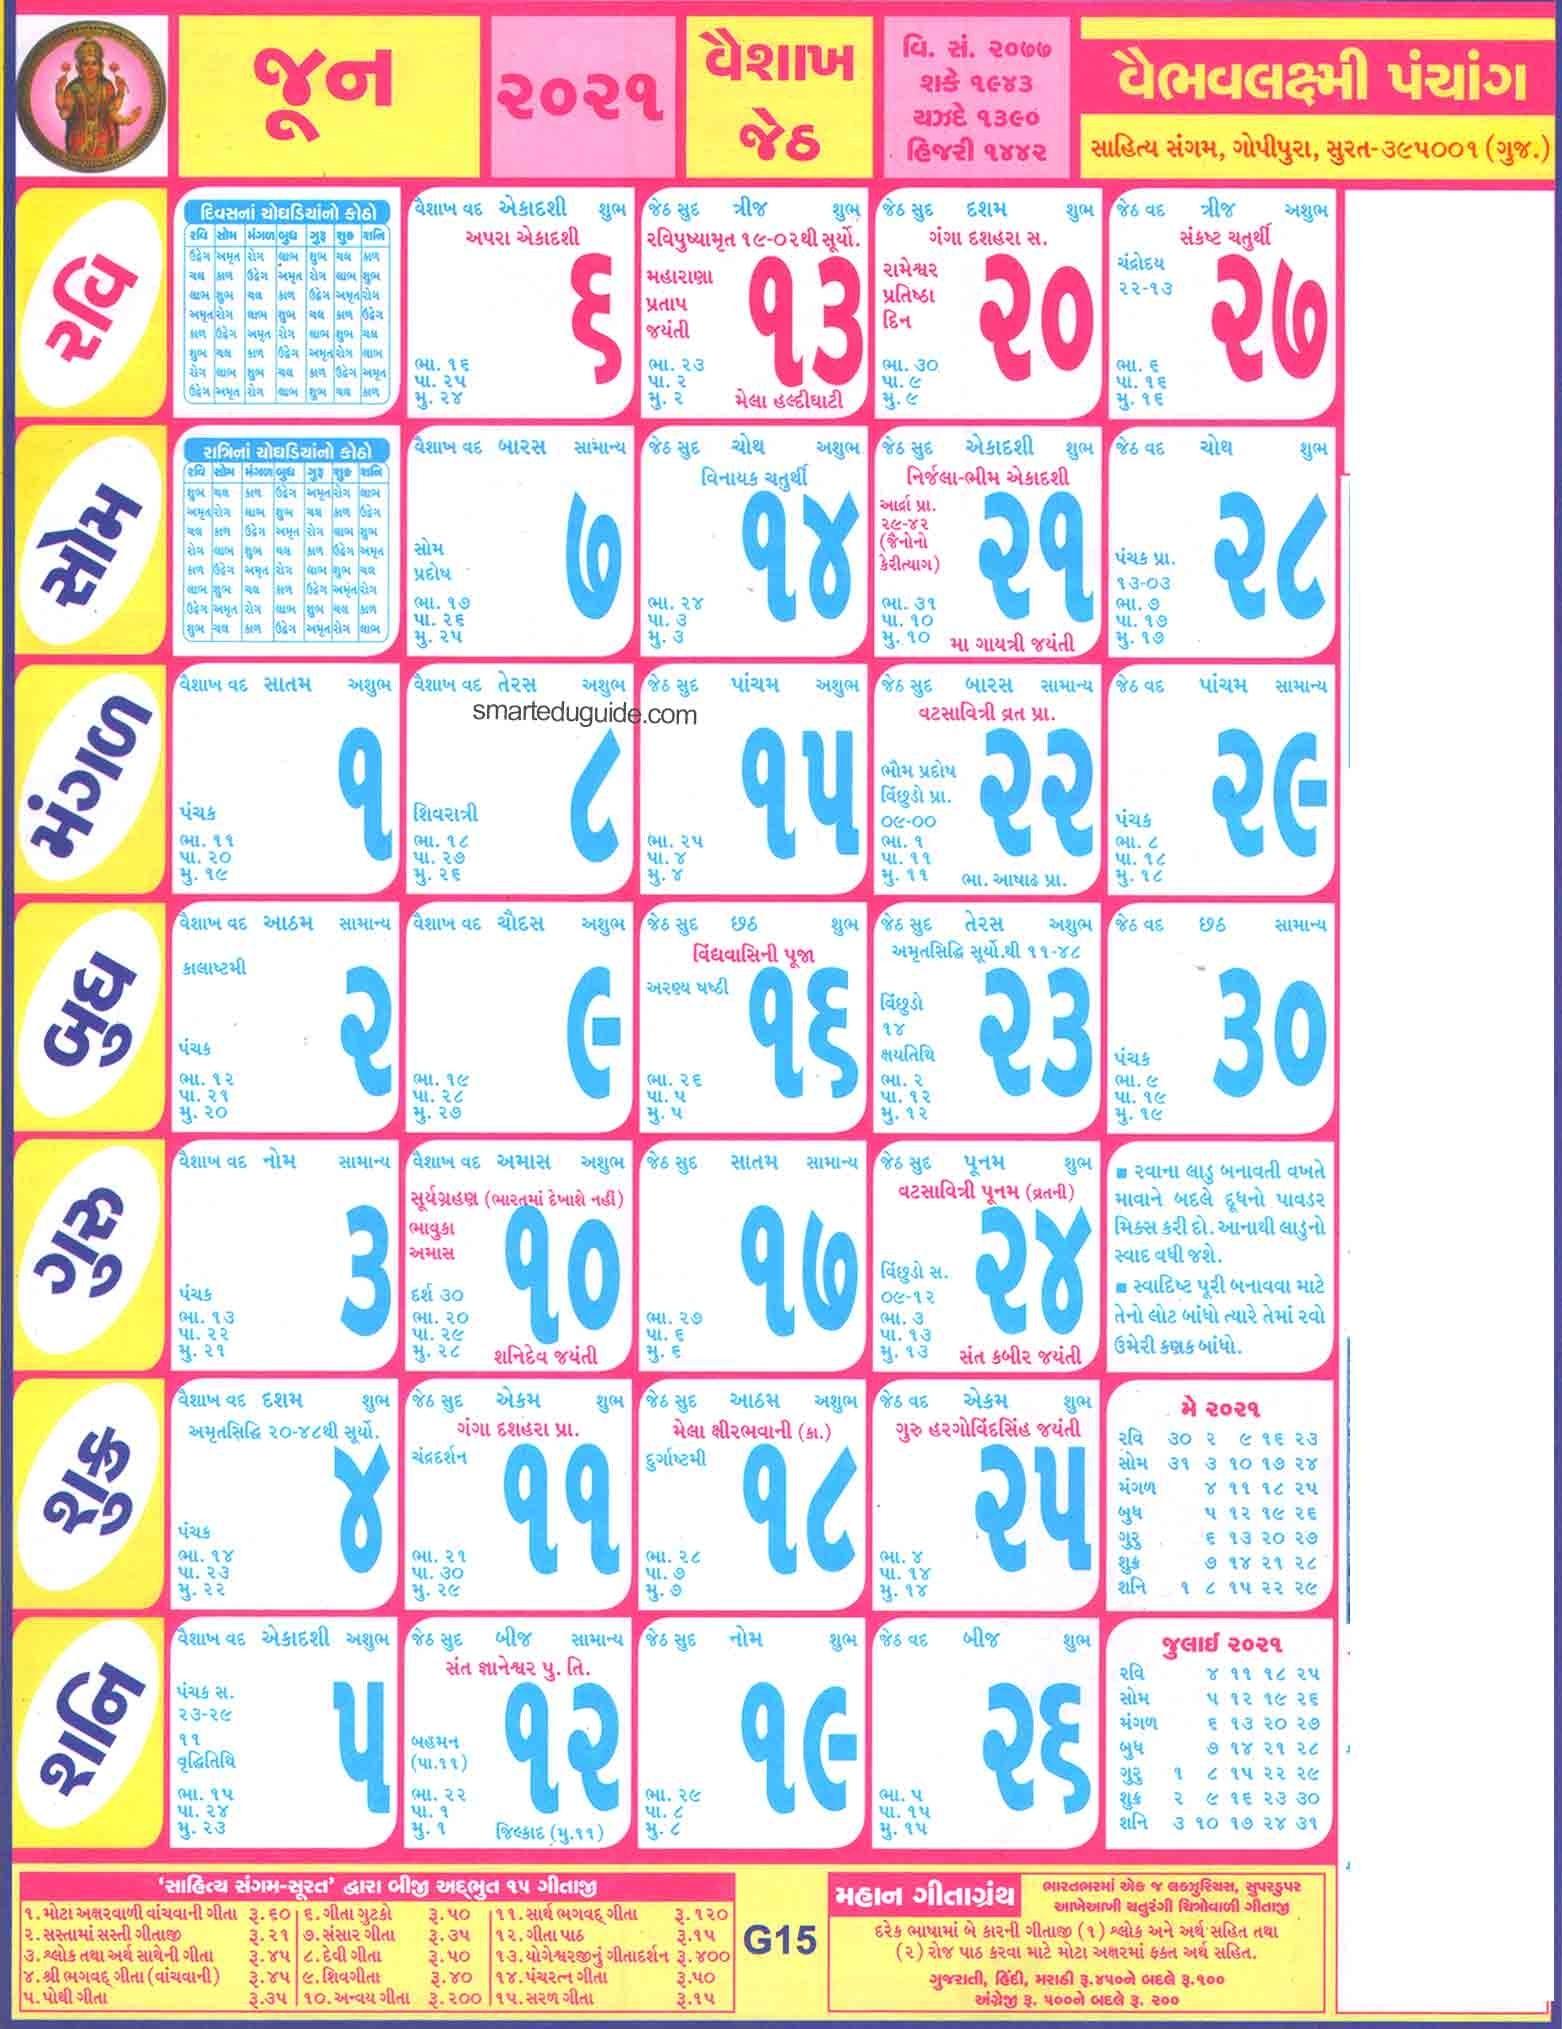 Gujarati Calendar 2021 June | Seg Gujarati Calendar September 2021 With Tithi